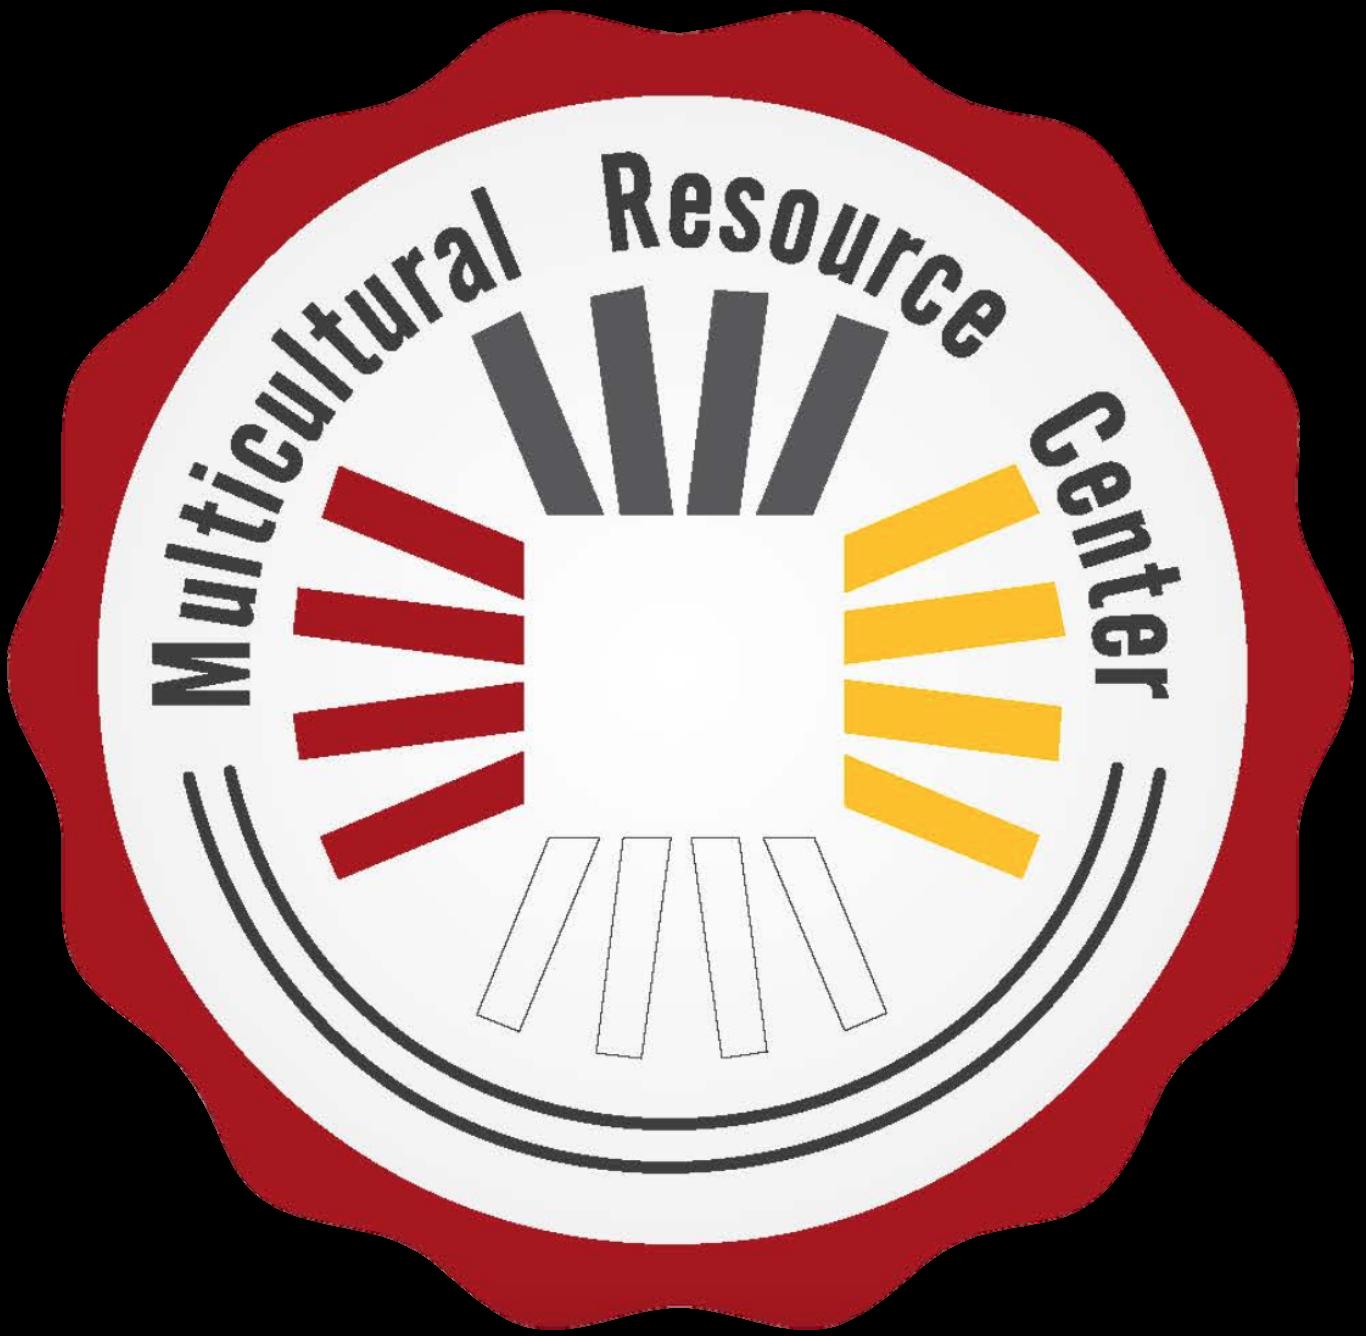 Volunteering clipart multicultural. Culture resource center